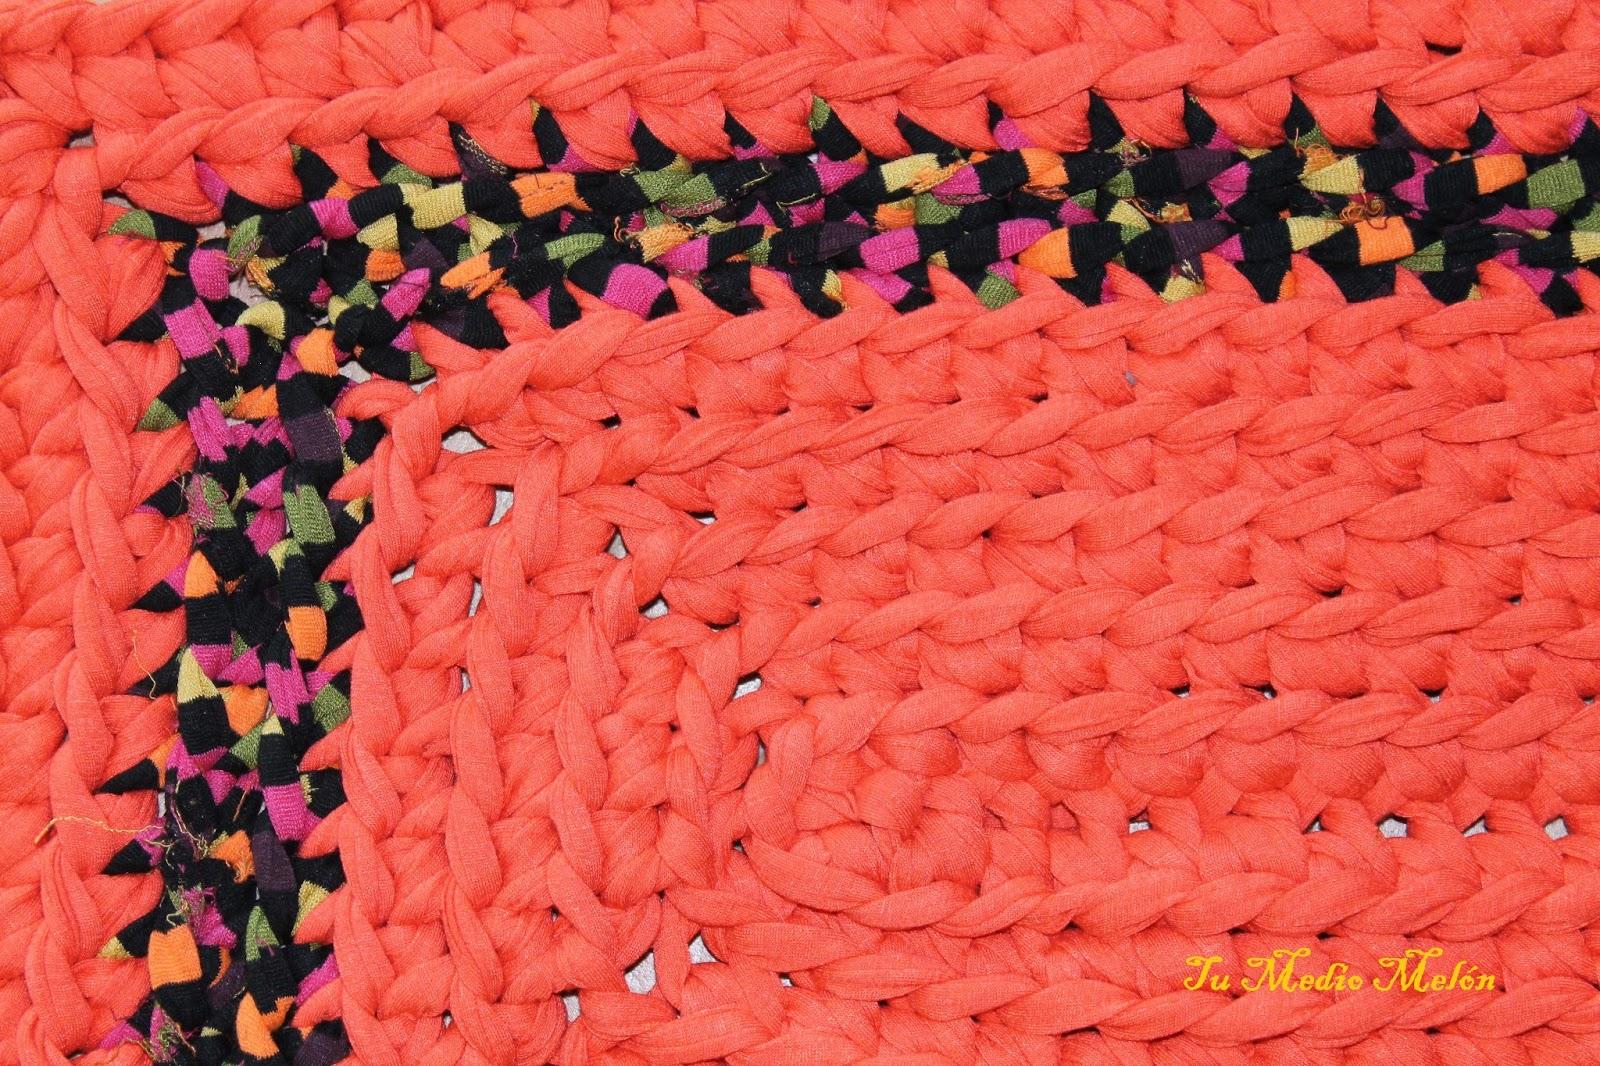 Tu medio mel n alfombra rectangular color salm n - Alfombra de trapillo cuadrada ...